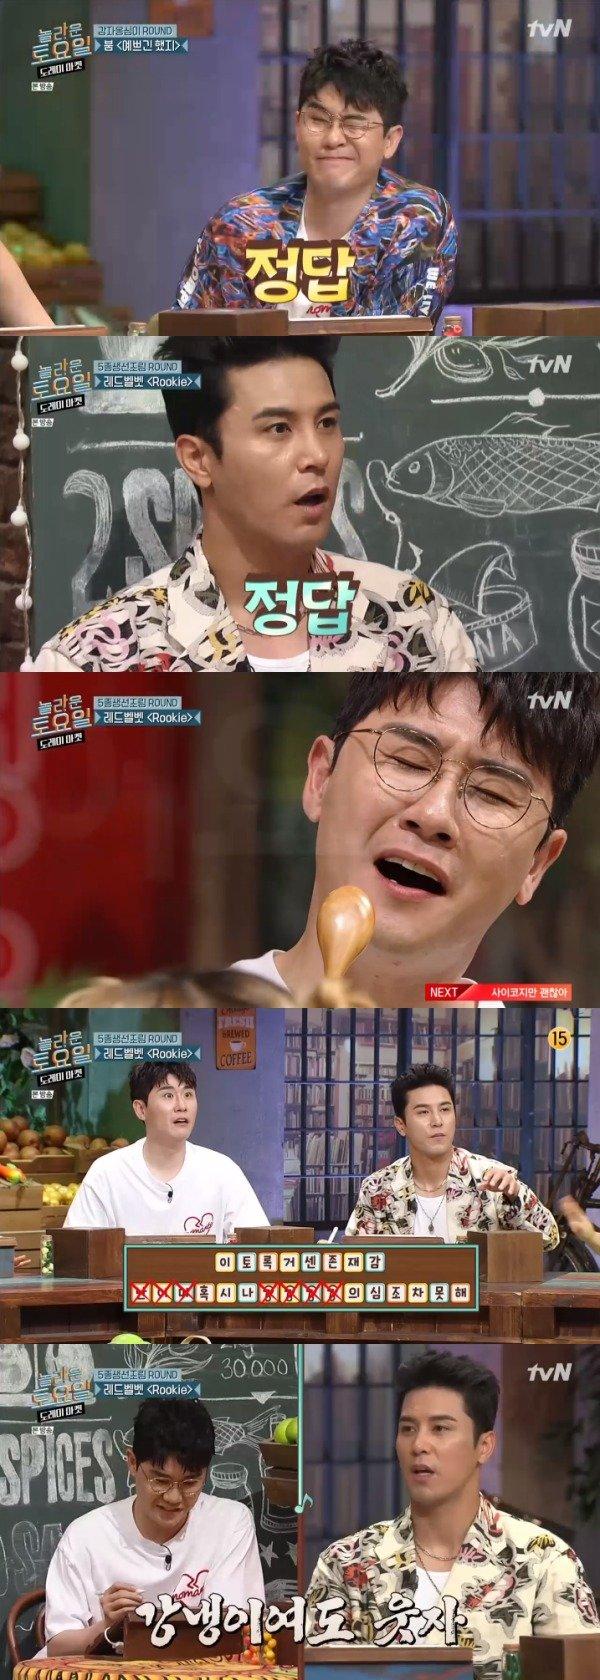 tvN '놀라운 토요일 도레미마켓' 방송 화면 캡처 © 뉴스1